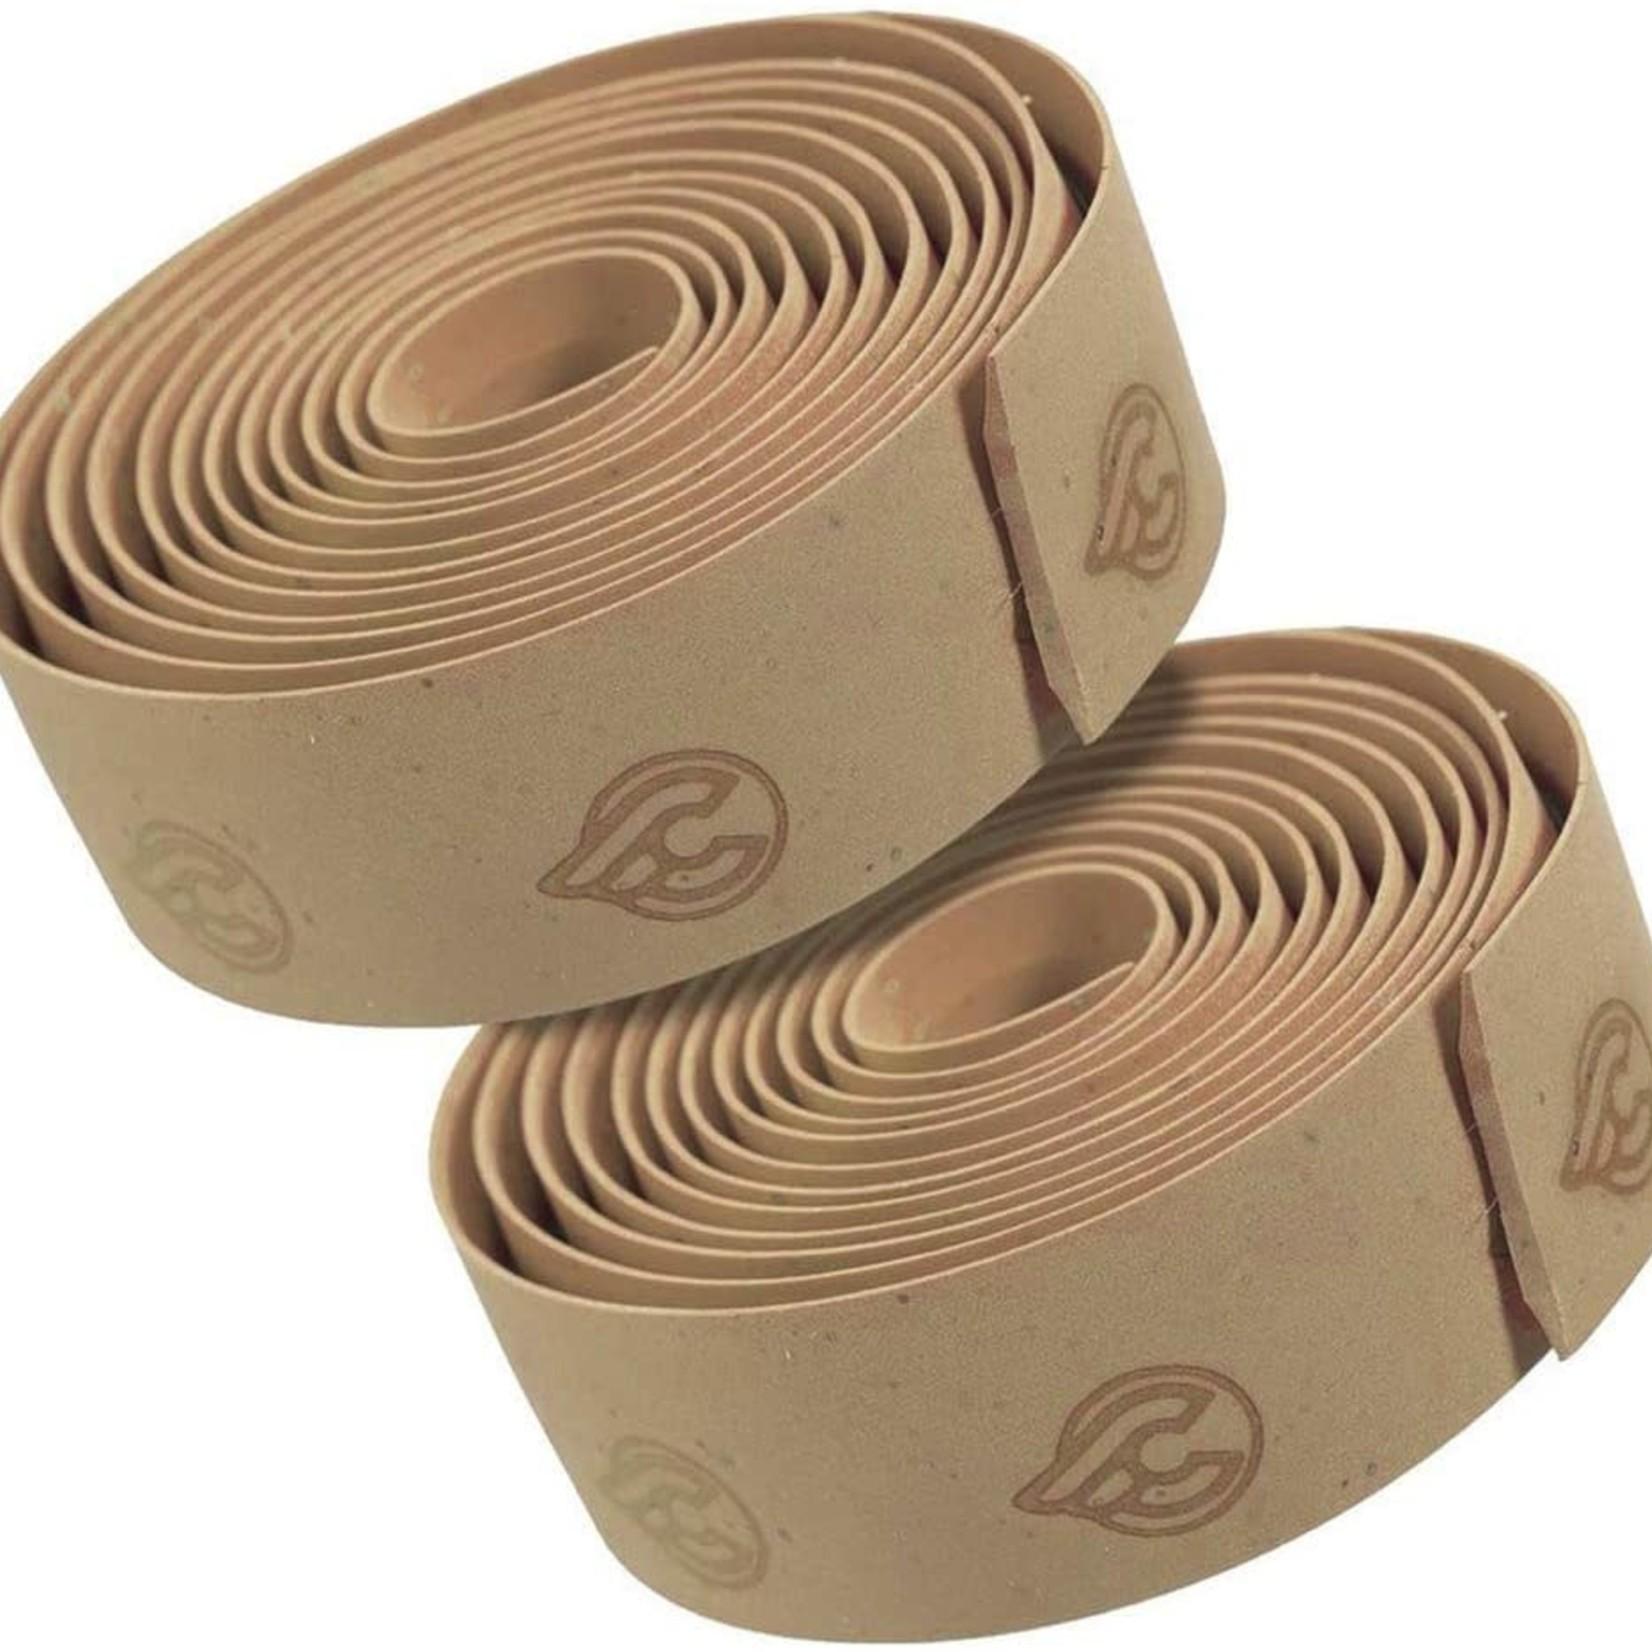 TAPE & PLUGS Cinelli Cork Ribbon Handlebar Tape Natural